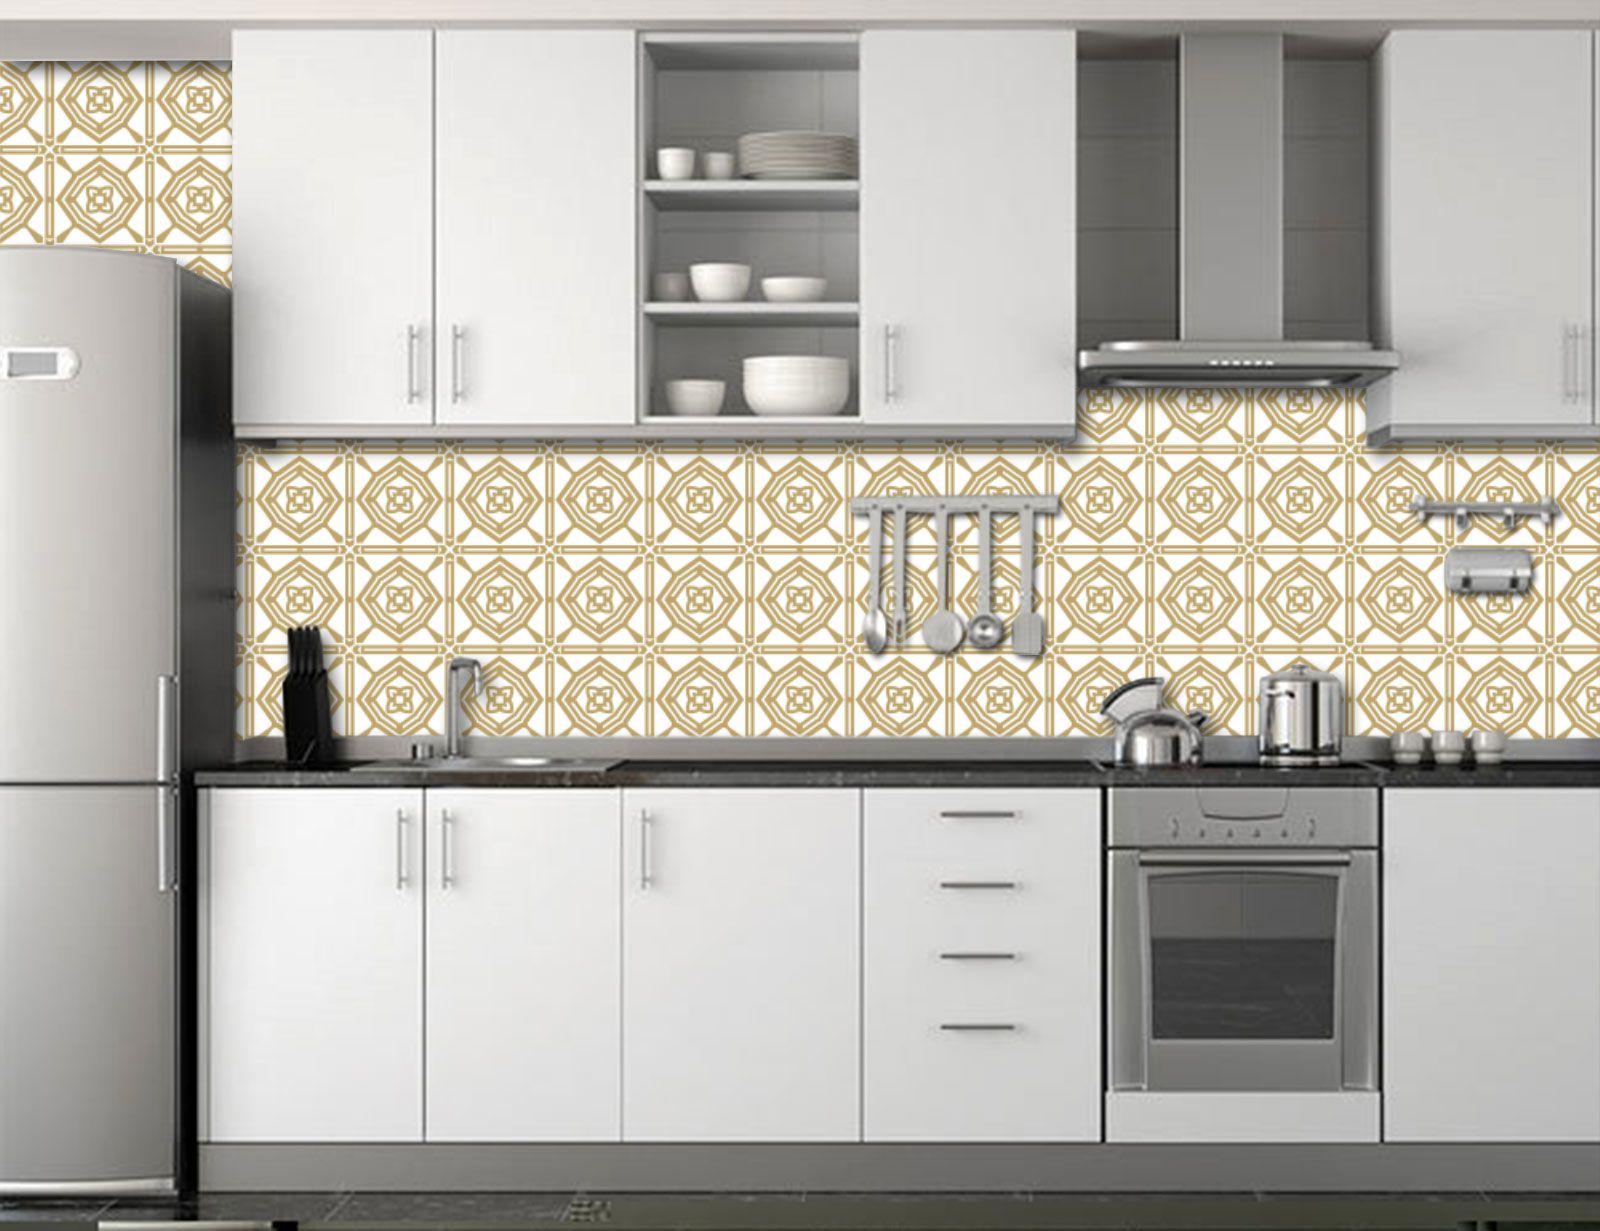 Papel de Parede Hidráulico 0032 Papel de Parede para Cozinha